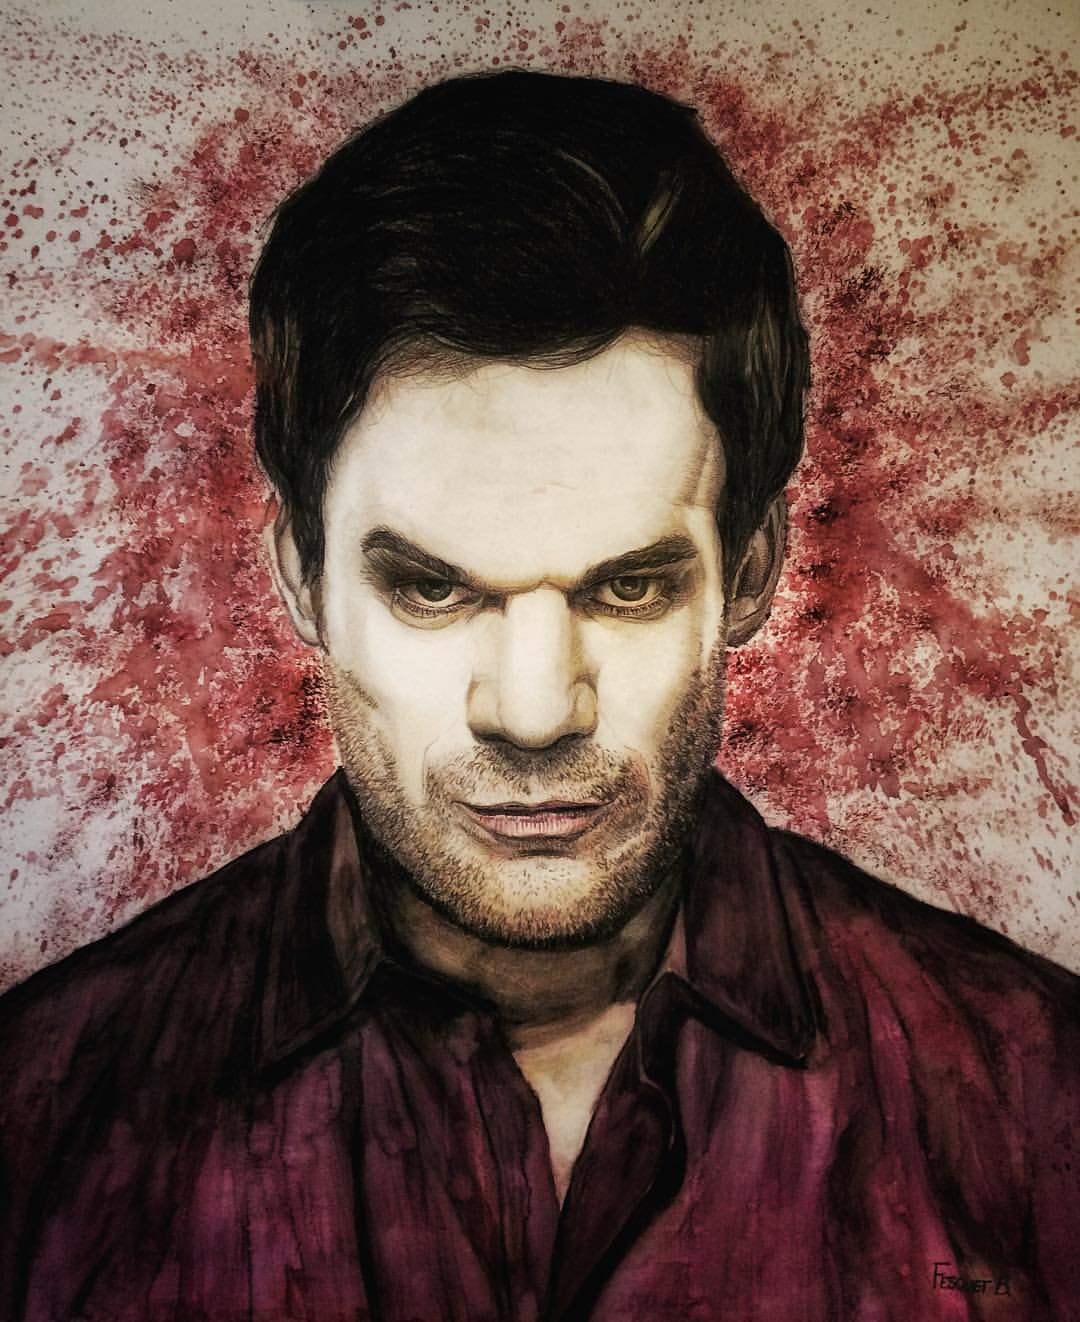 4 - Dexter Morgan - Dexter. Crayon aquarelle + aquarelle, papier, 55x46cm